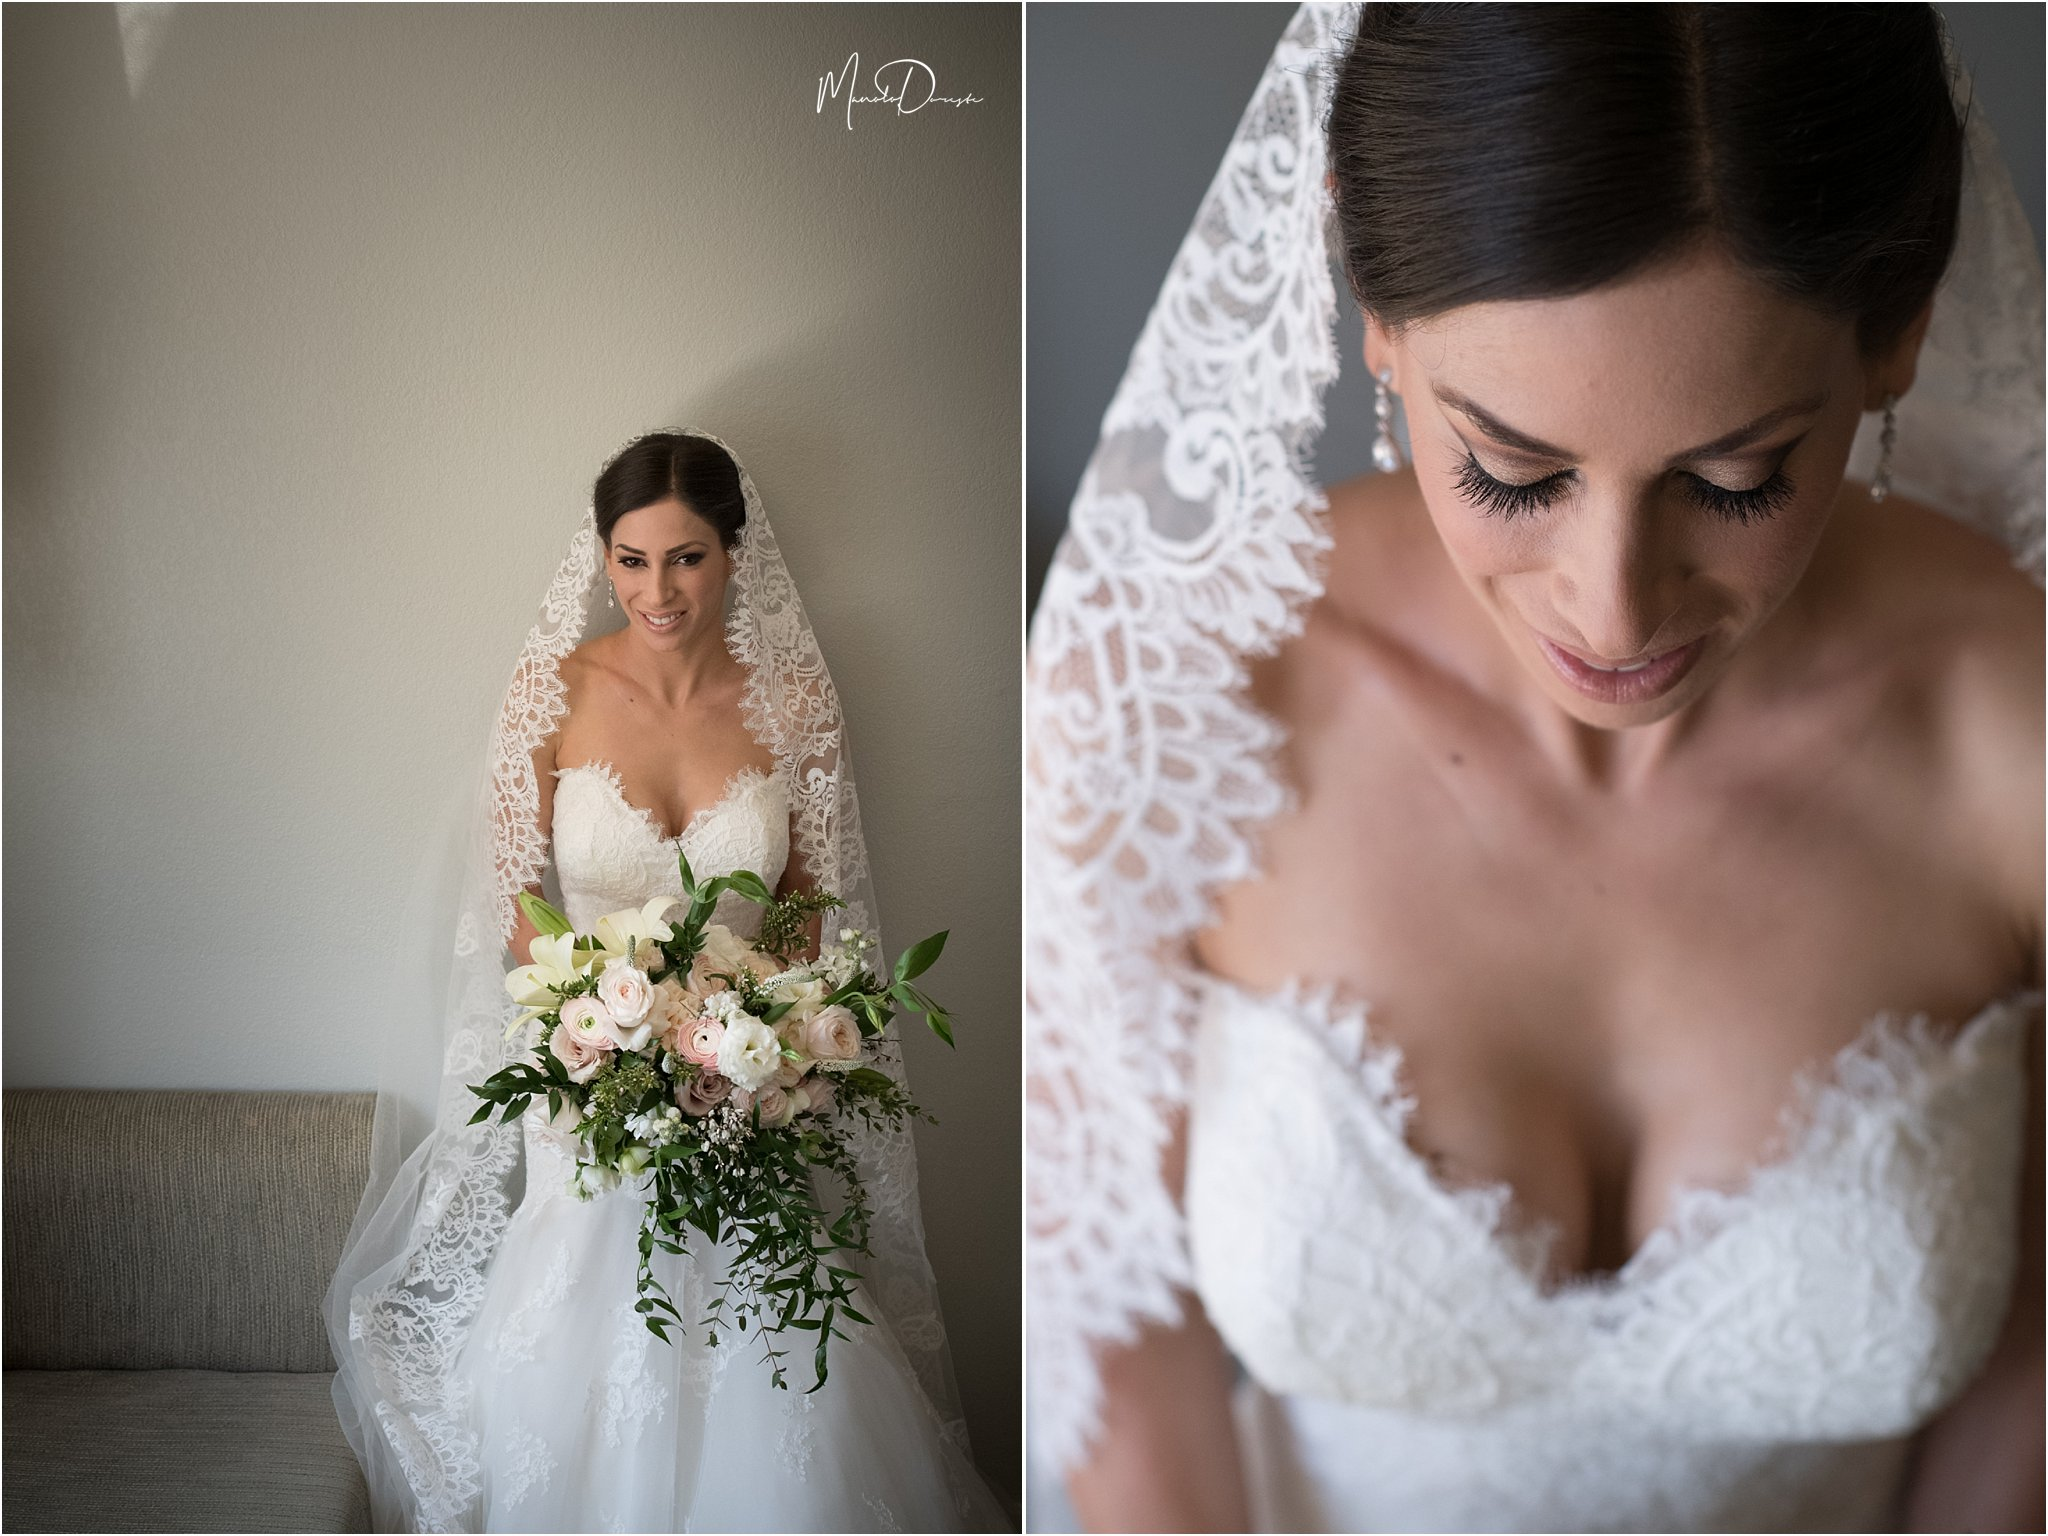 00749_ManoloDoreste_InFocusStudios_Wedding_Family_Photography_Miami_MiamiPhotographer.jpg